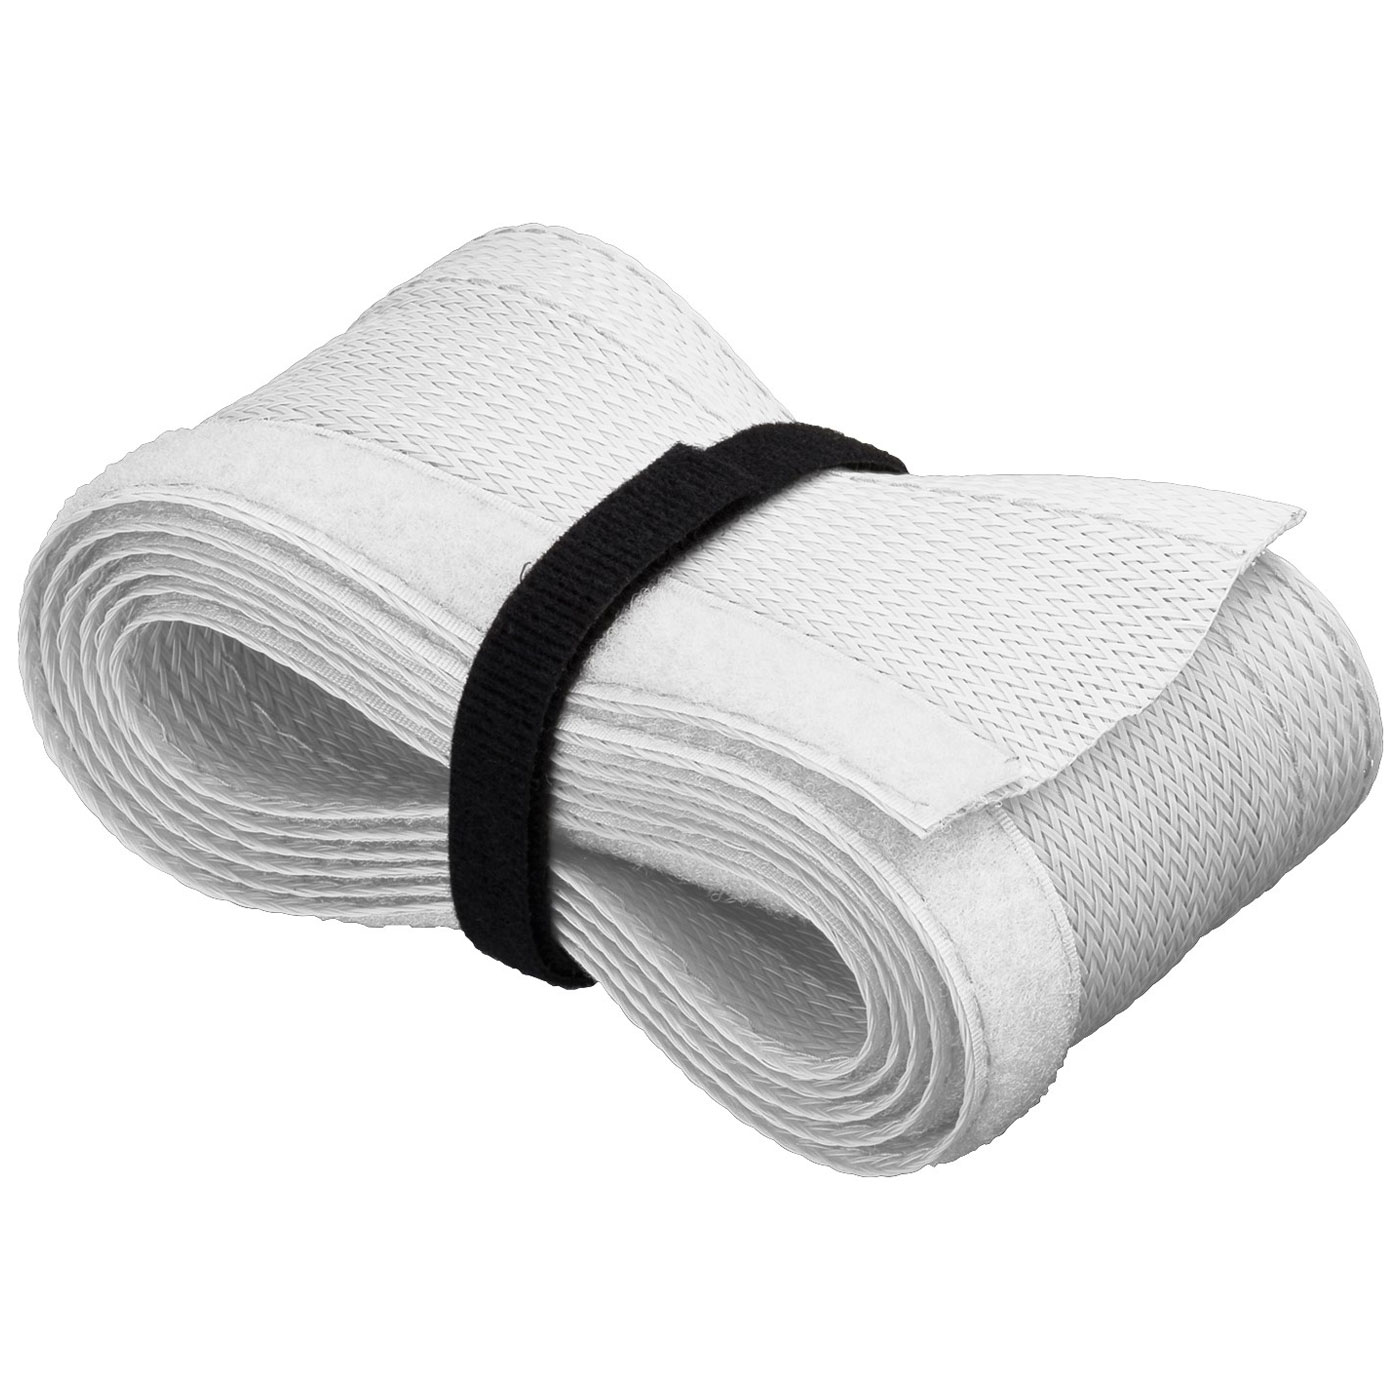 Passe câble Goobay WireSleeve Blanc Manchon de câble flexible - 1.8 m